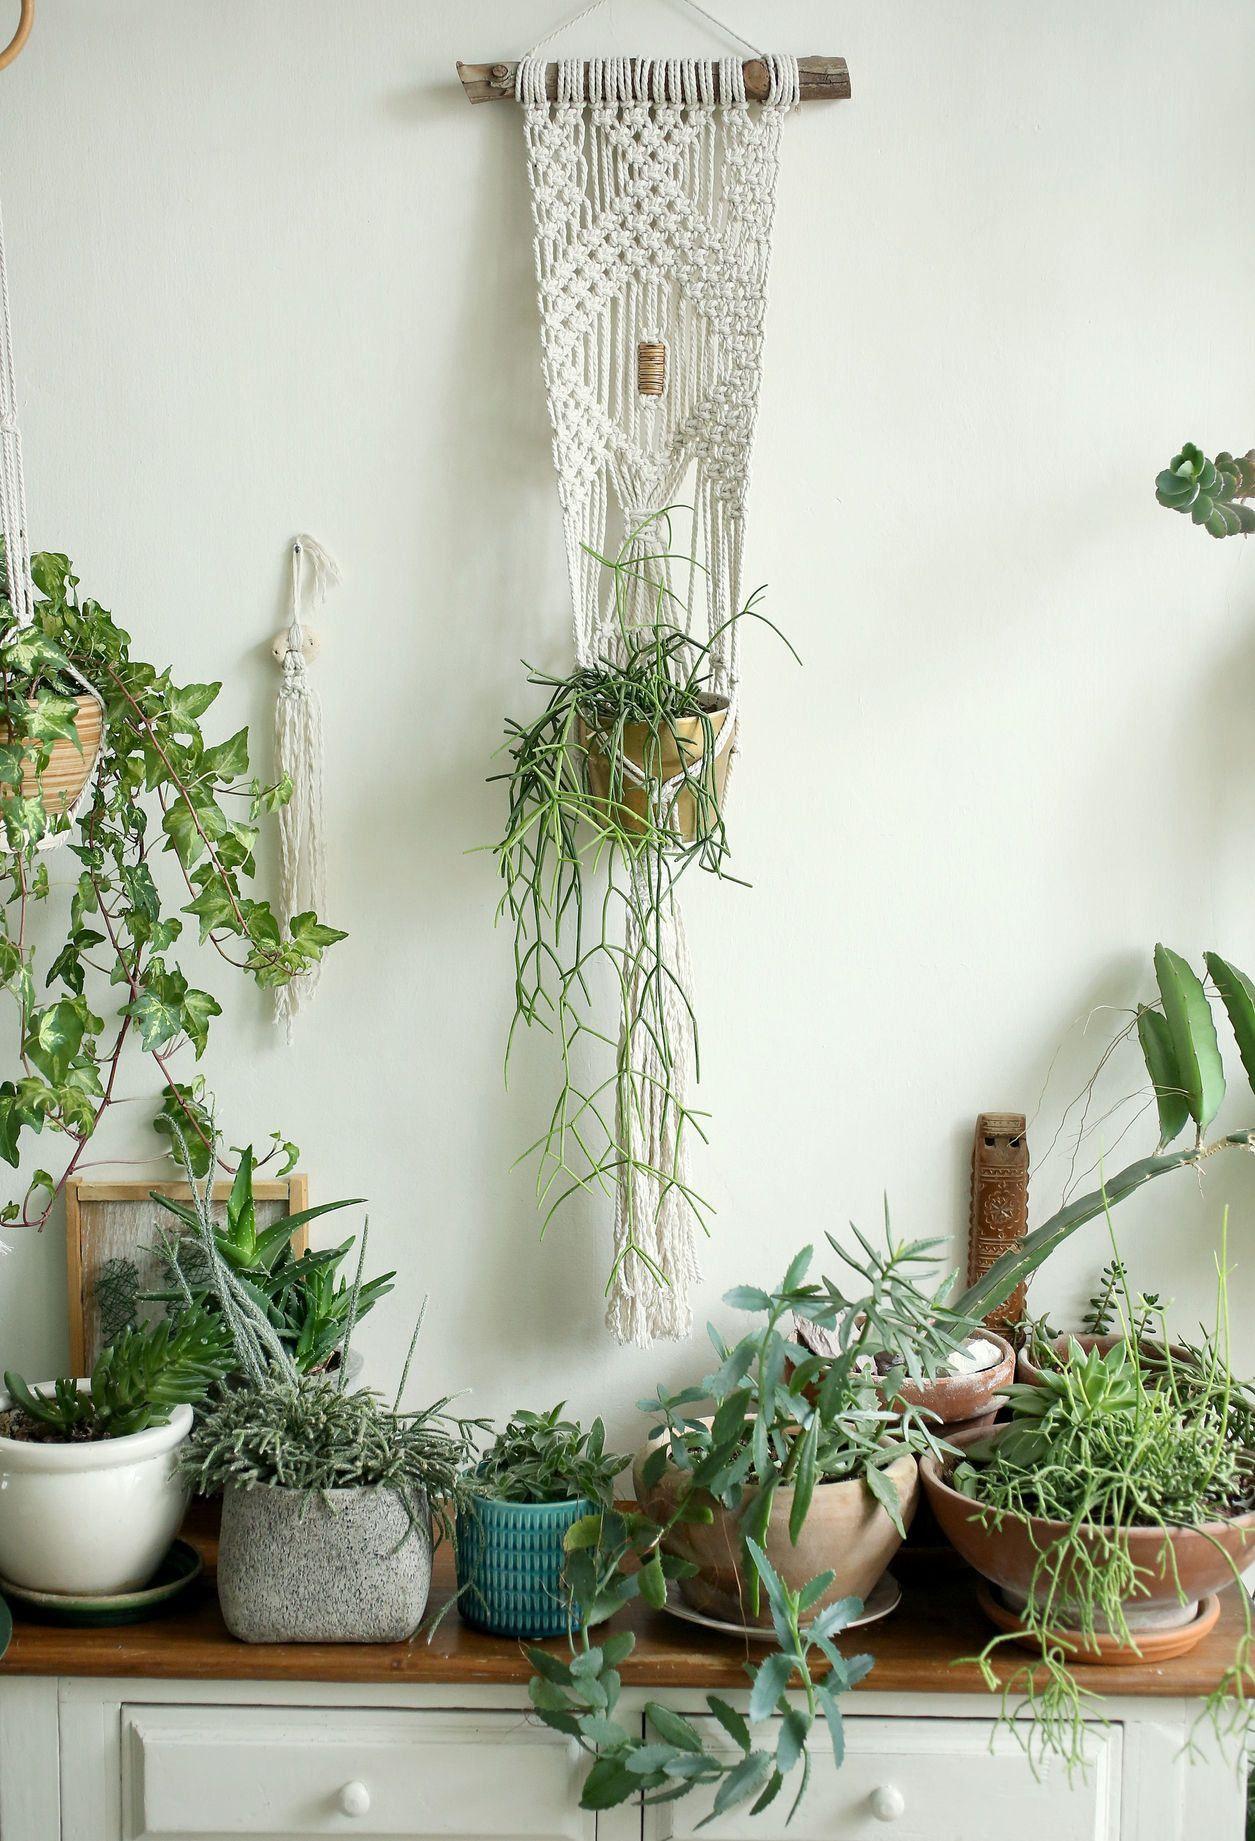 Hanging Planter, Macrame Plant Hange, Macrame Plant, Wall Art, Boho